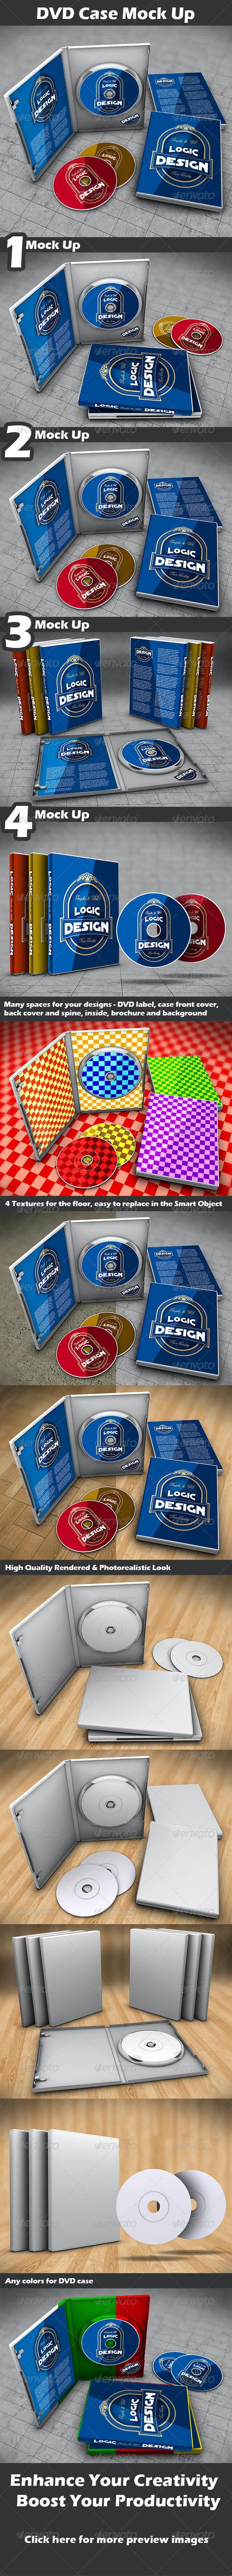 DVD Case Mock Up - Discs Packaging